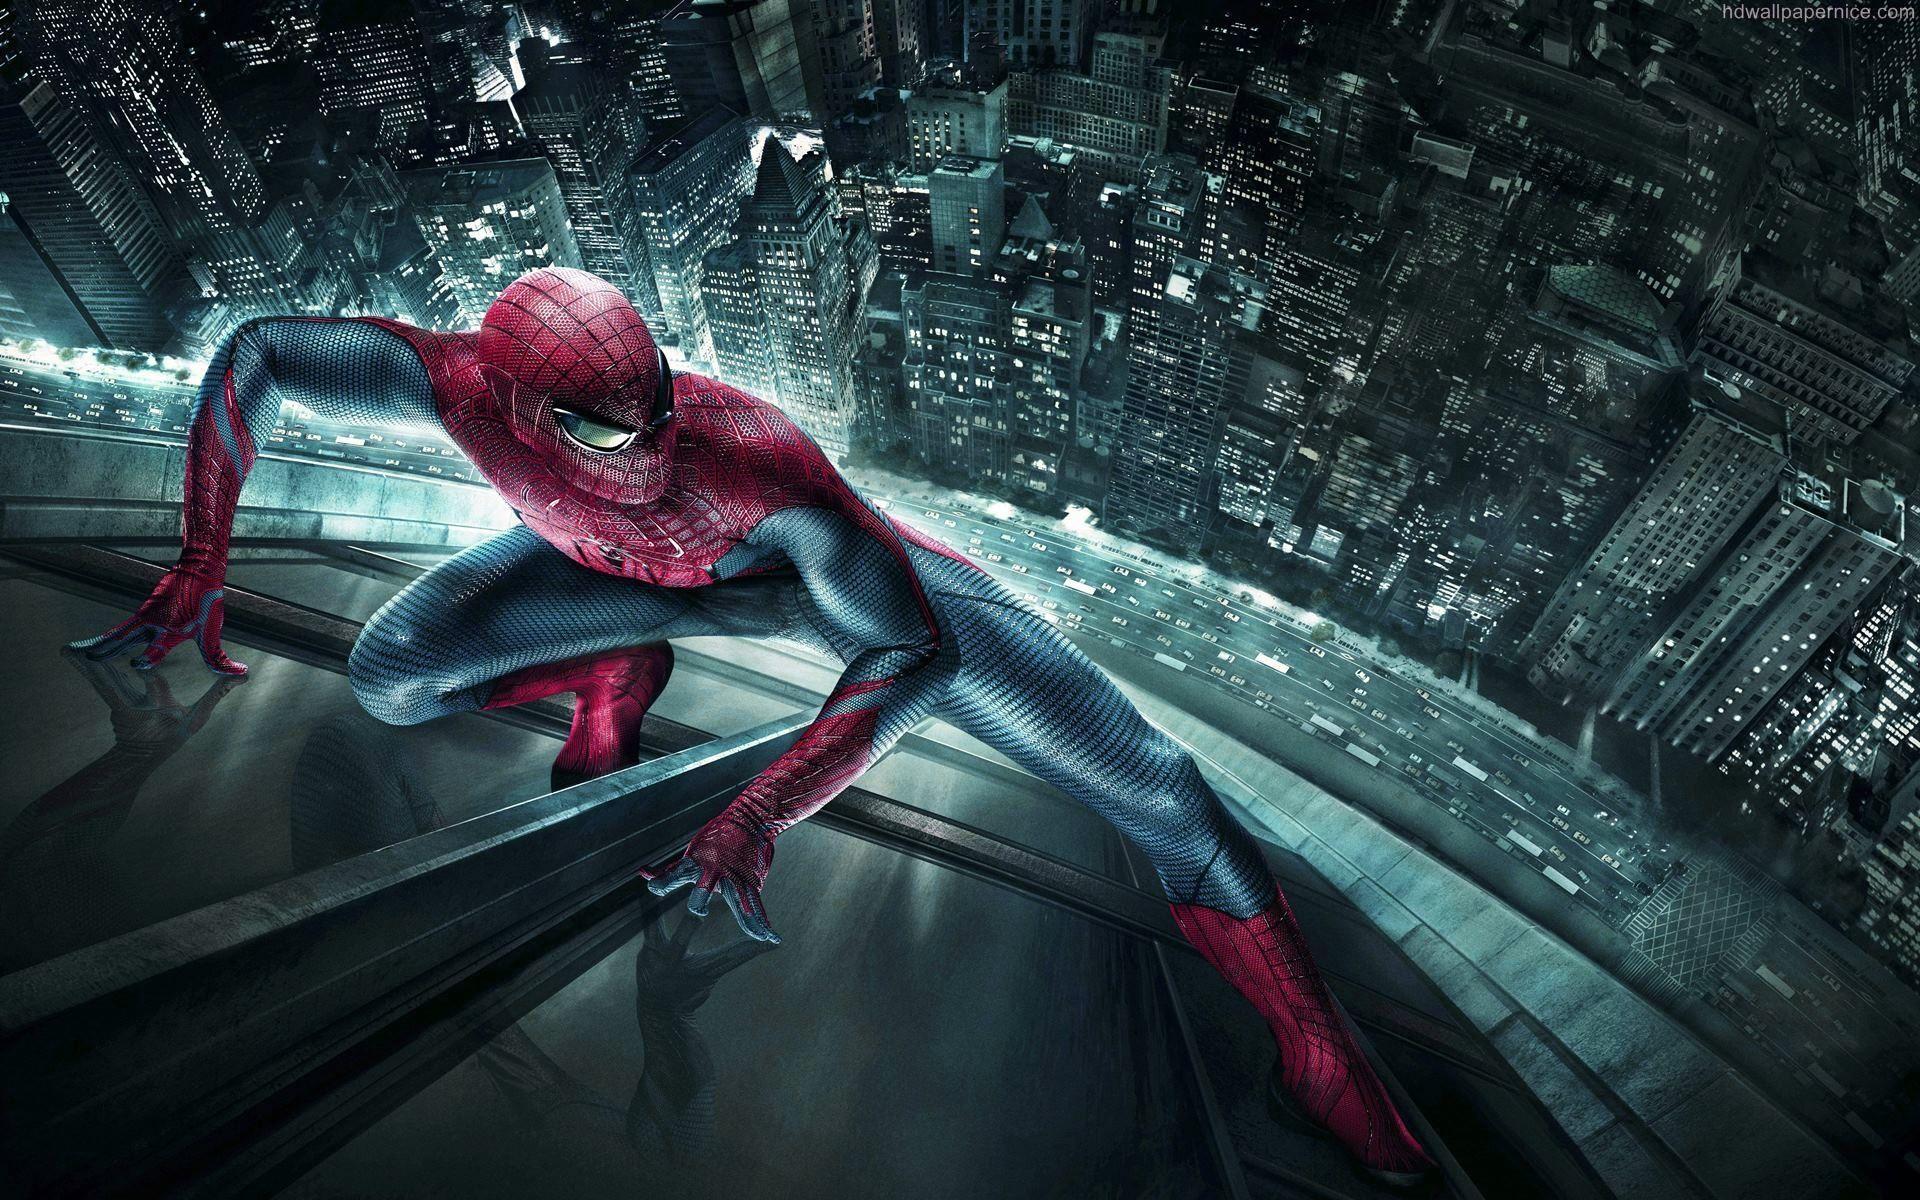 Spiderman Full Hd Wallpaper - Spiderman Imagenes De Full Hd - HD Wallpaper